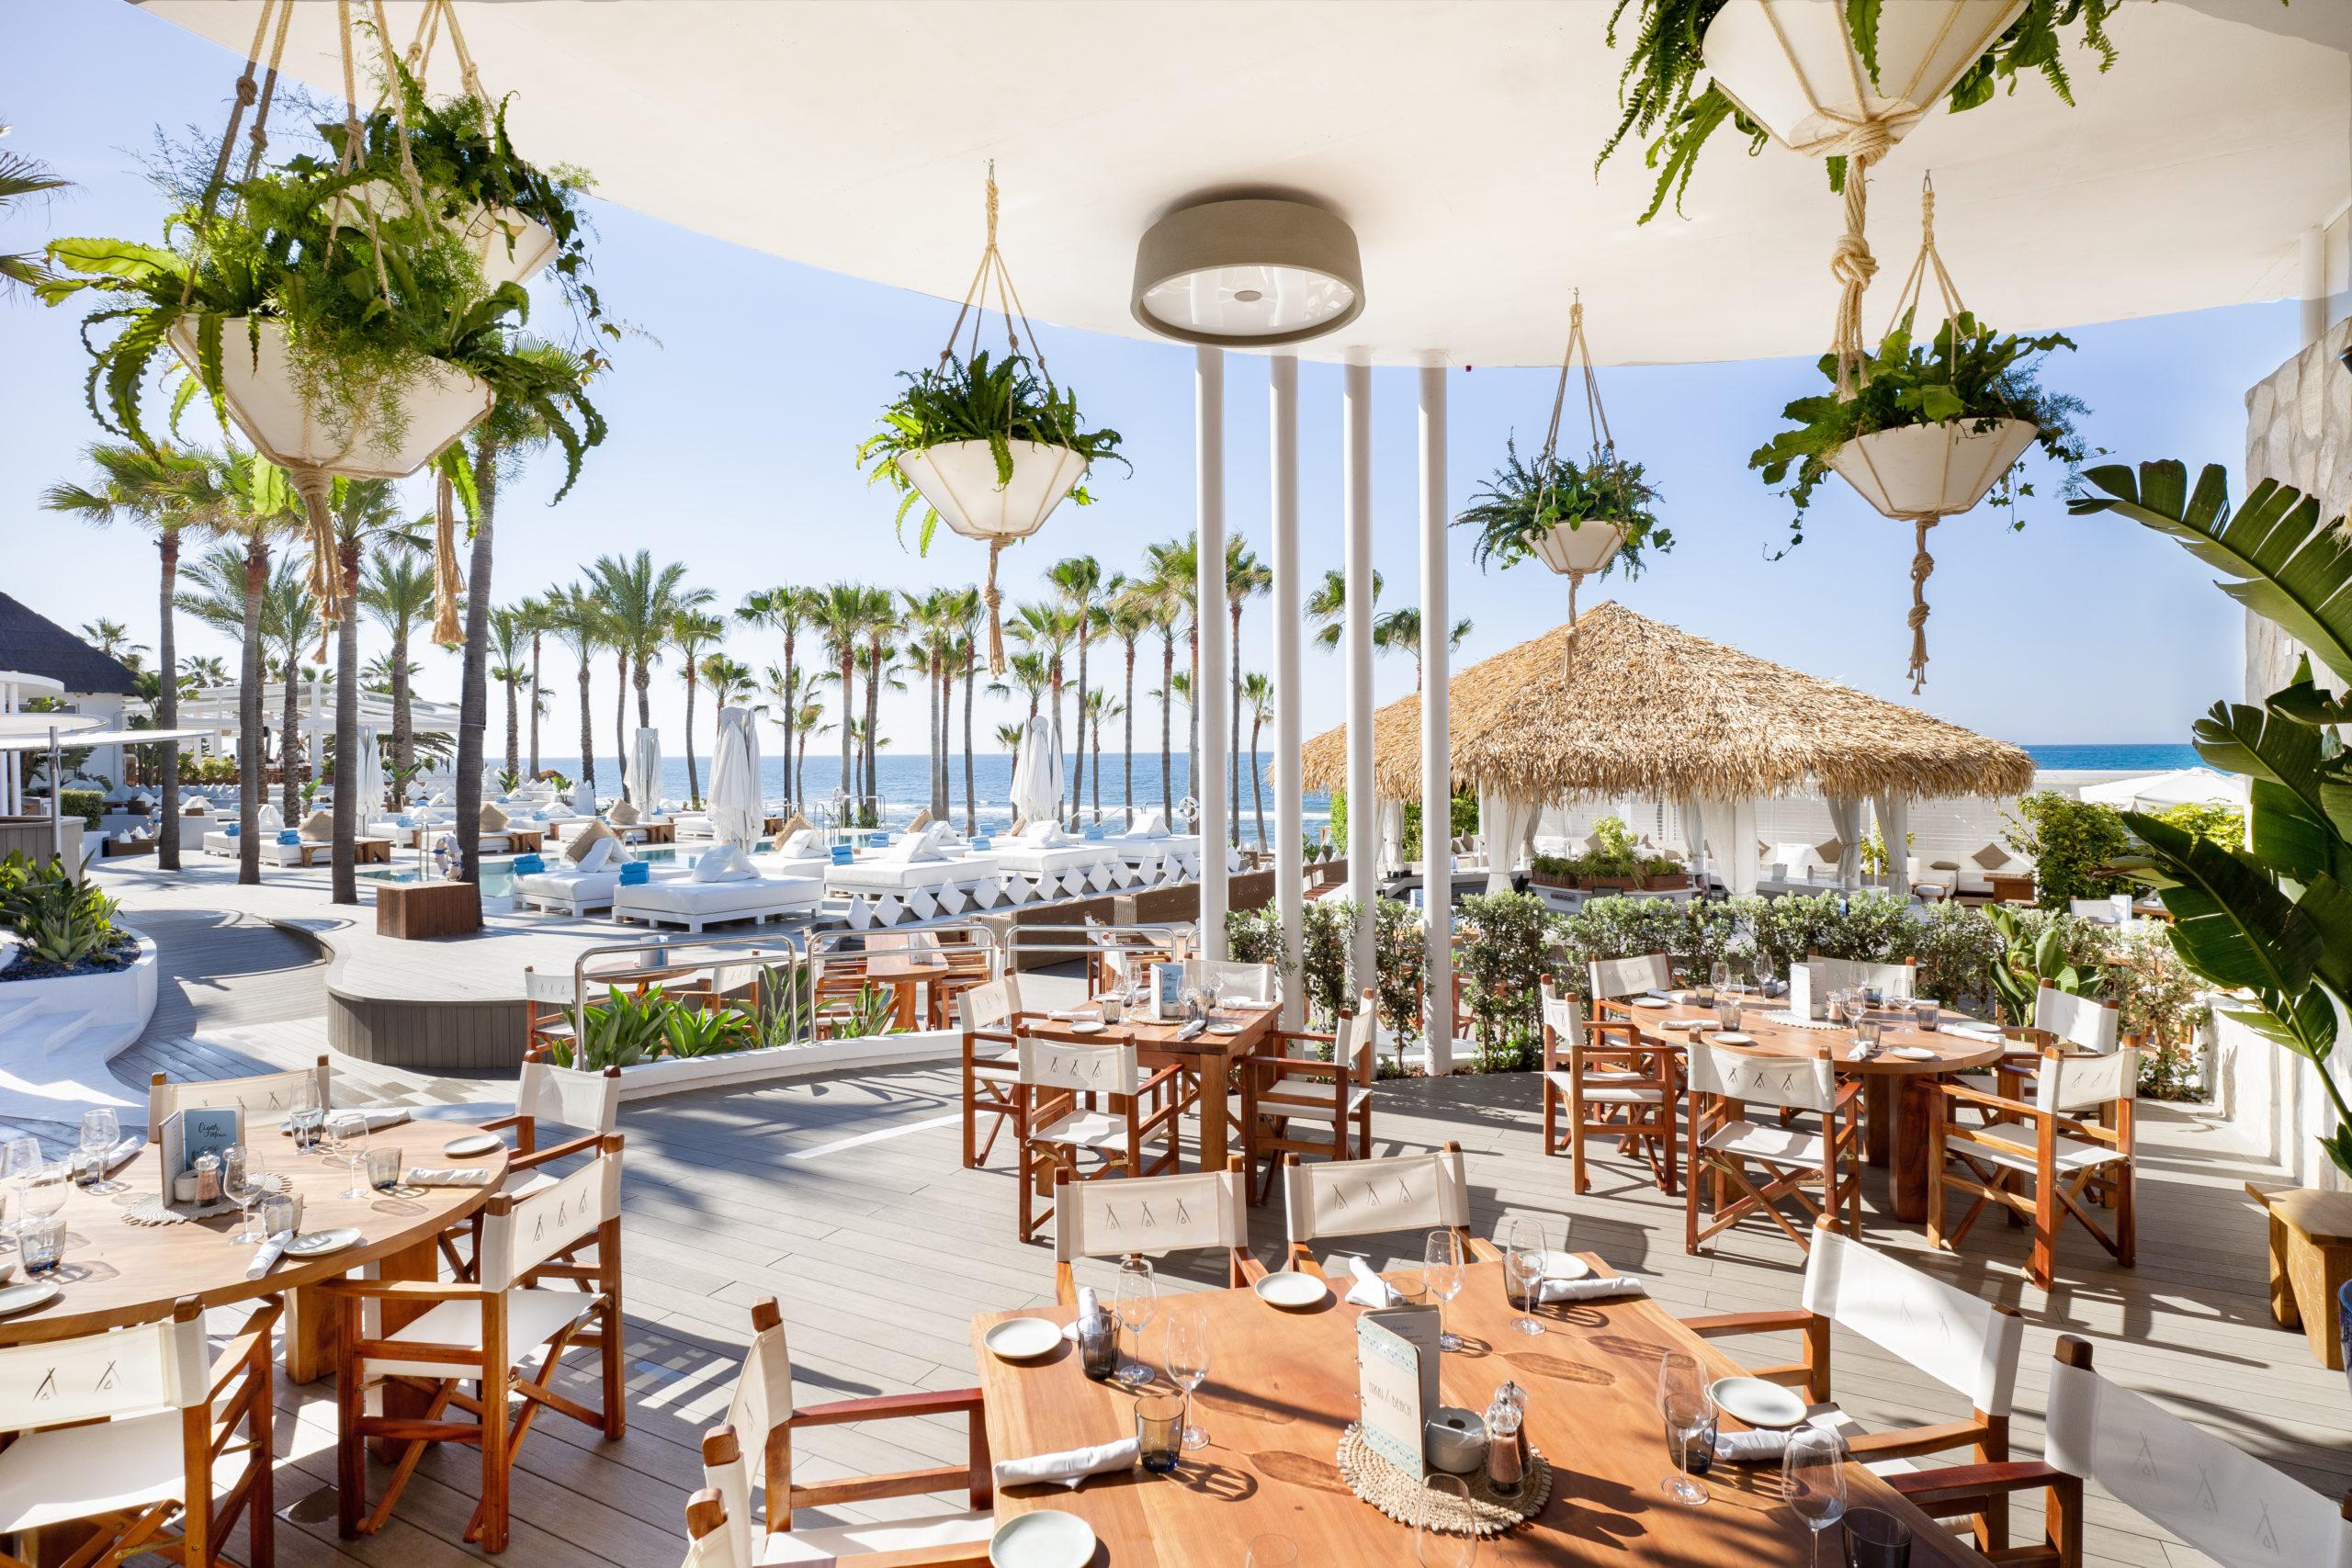 Nikki Beach Marbella 2020 Prices